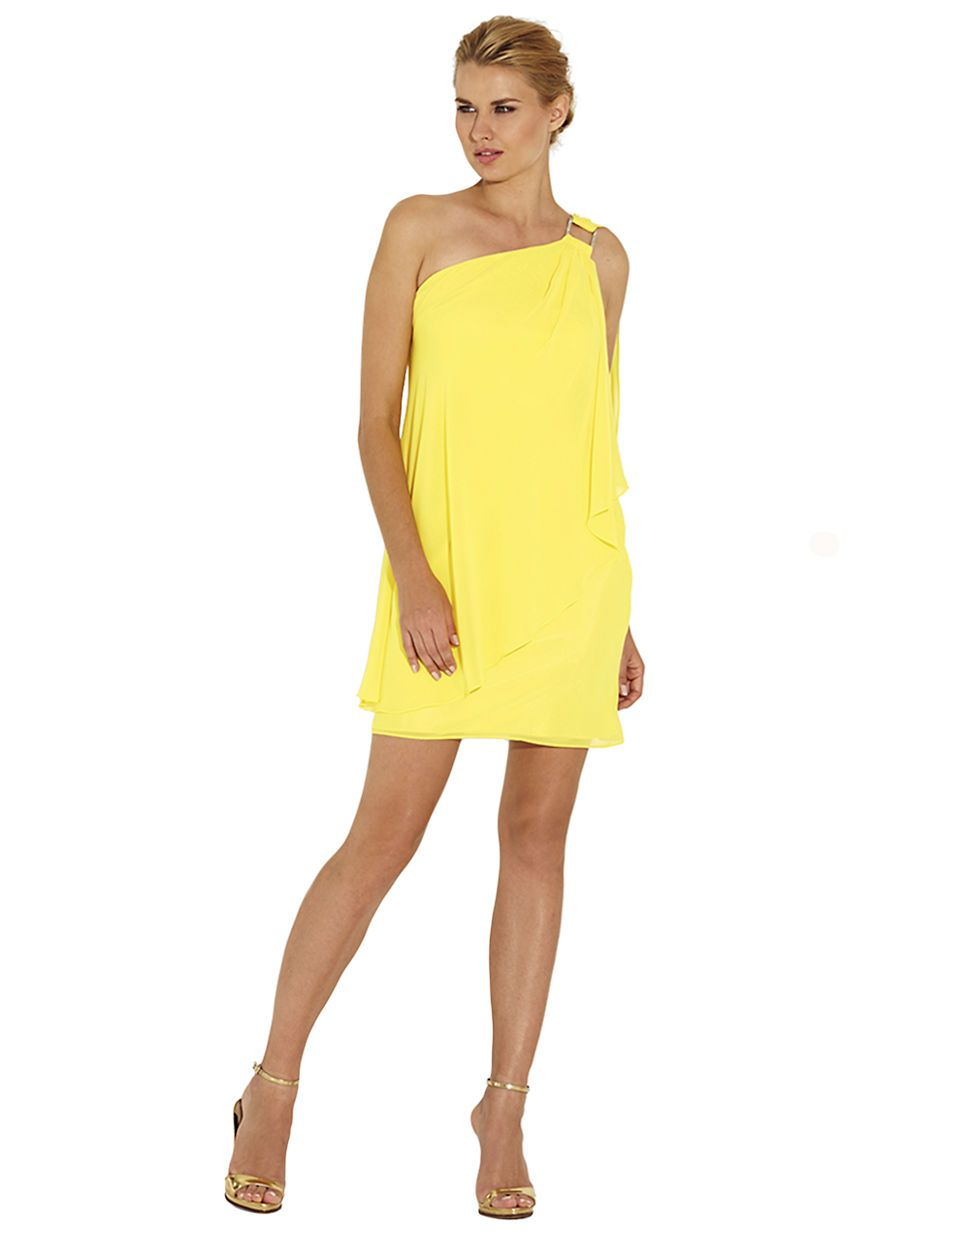 Yellow Chiffon One Shoulder Cape Cocktail Dress | fashjourney.com ...